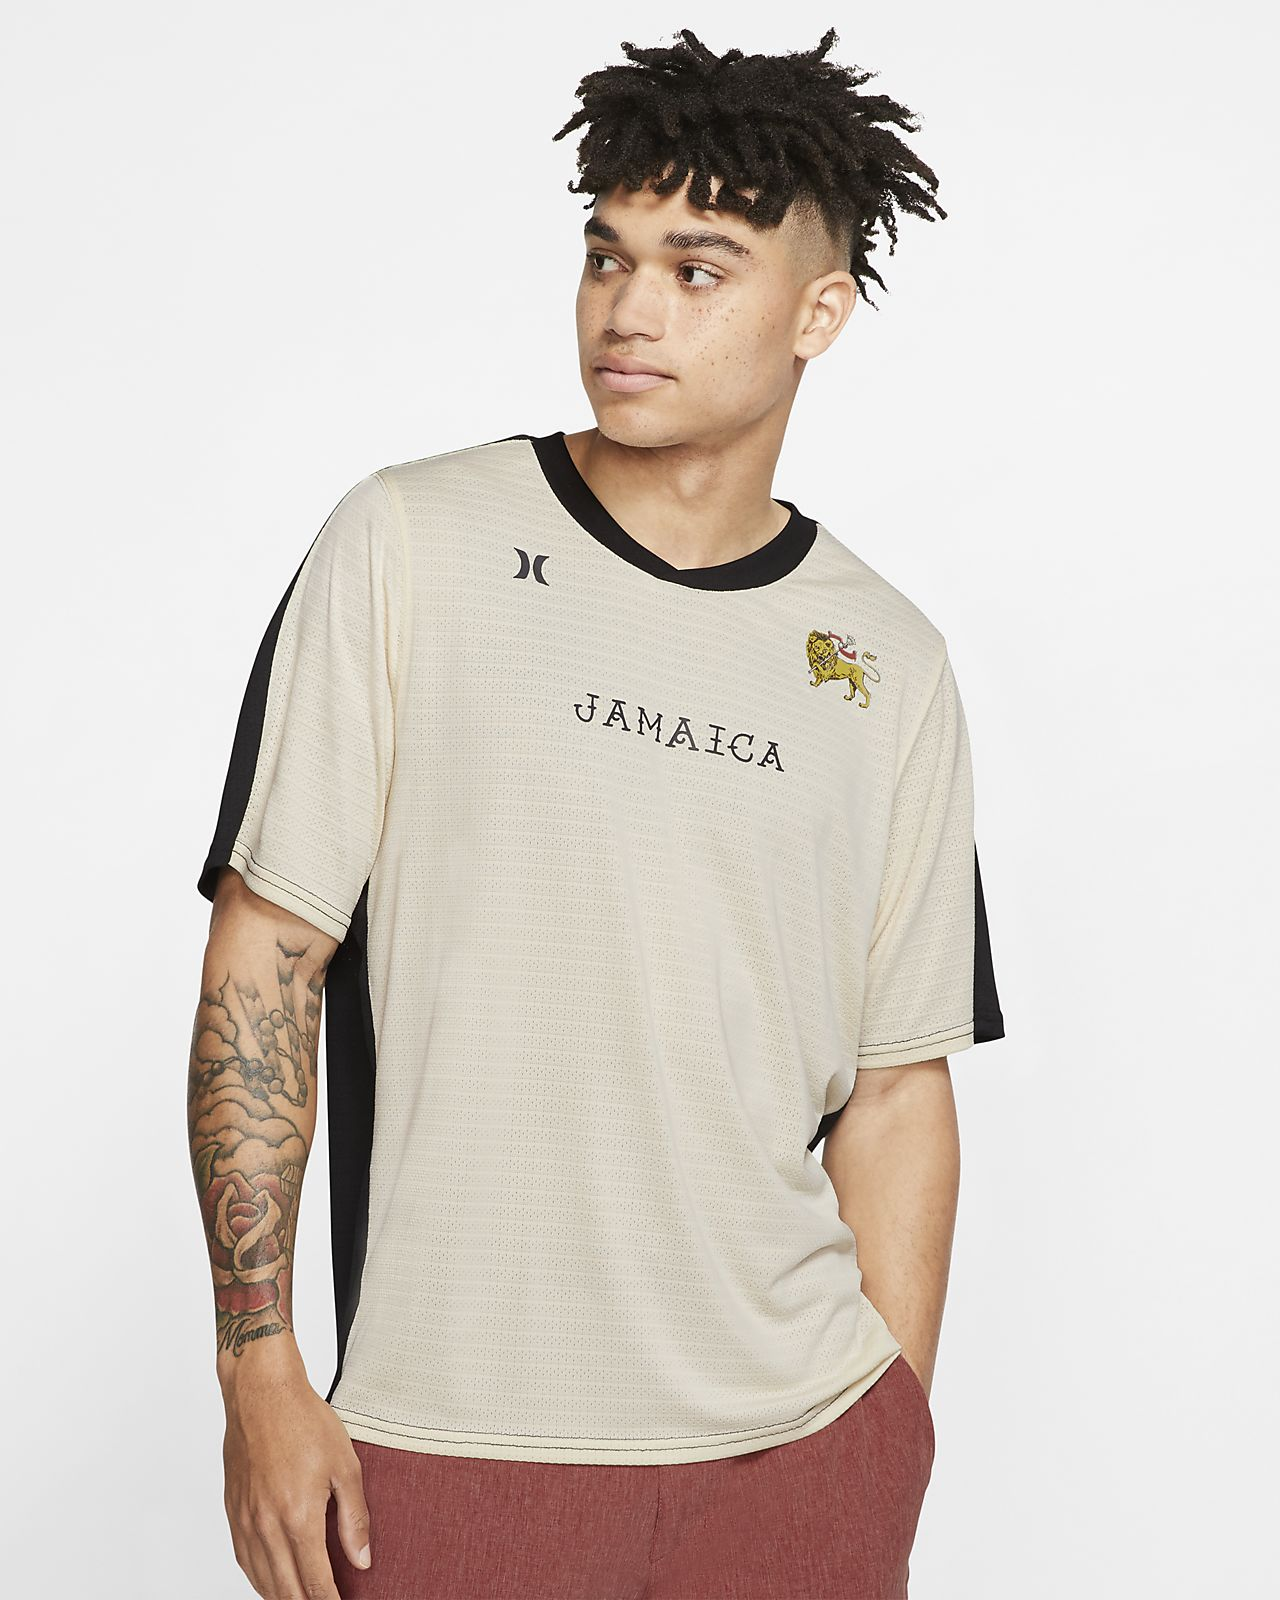 Hurley Kingston Men's Short-Sleeve Knit Shirt